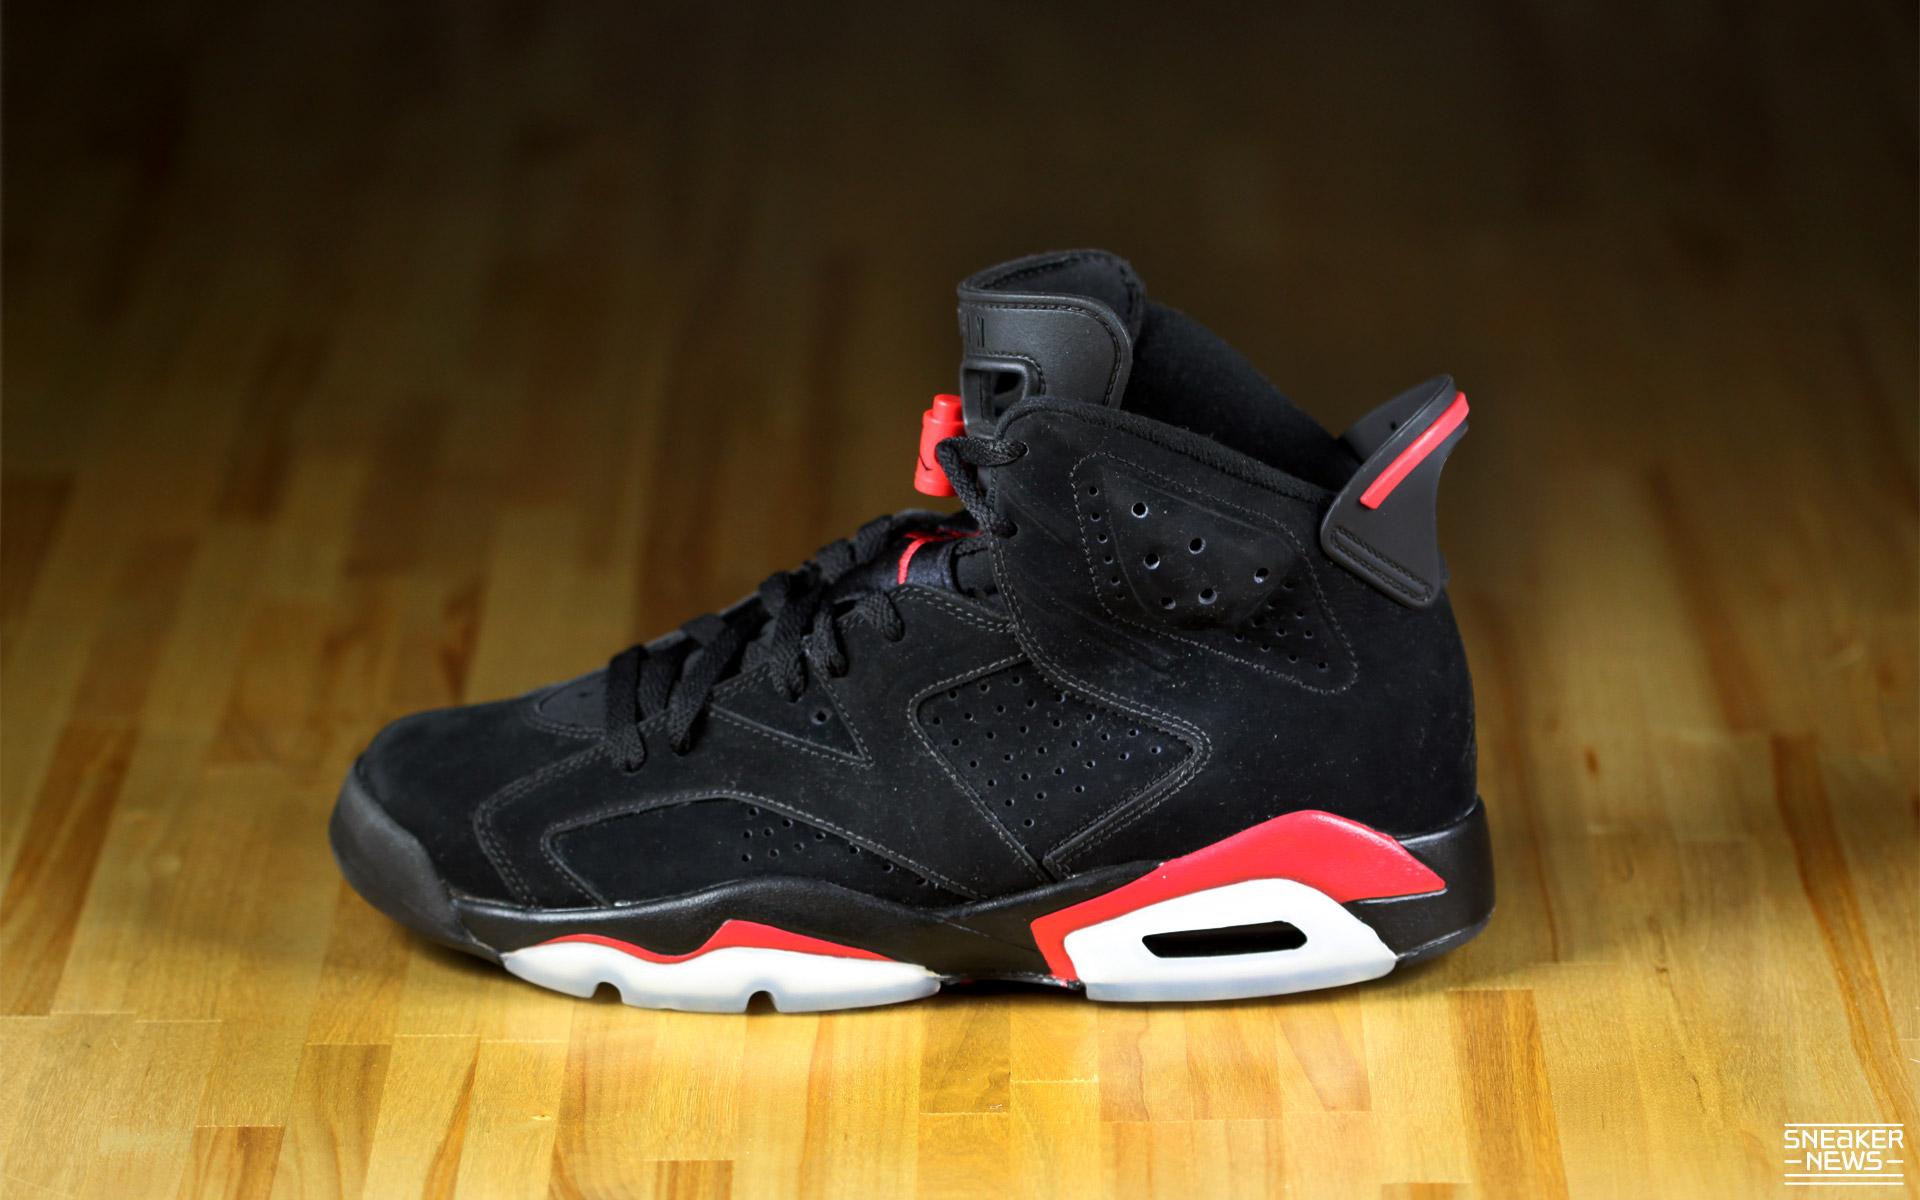 Sneaker Wallpapers - SneakerNews.com